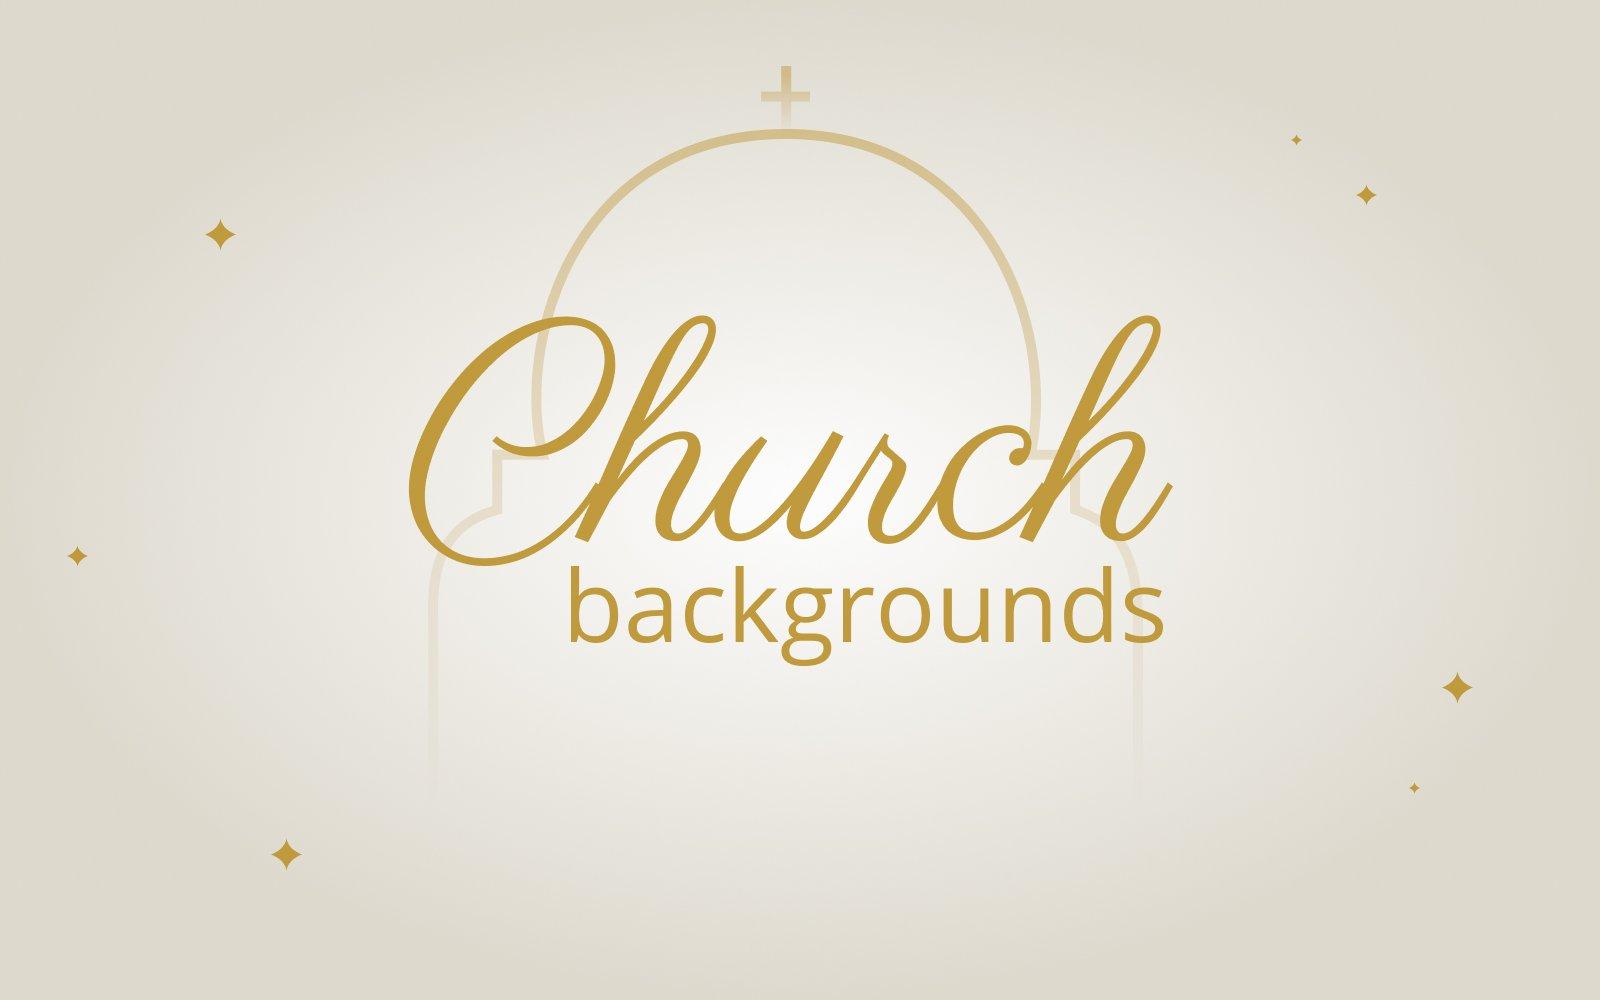 """10 Free Church"" - Background №125960"